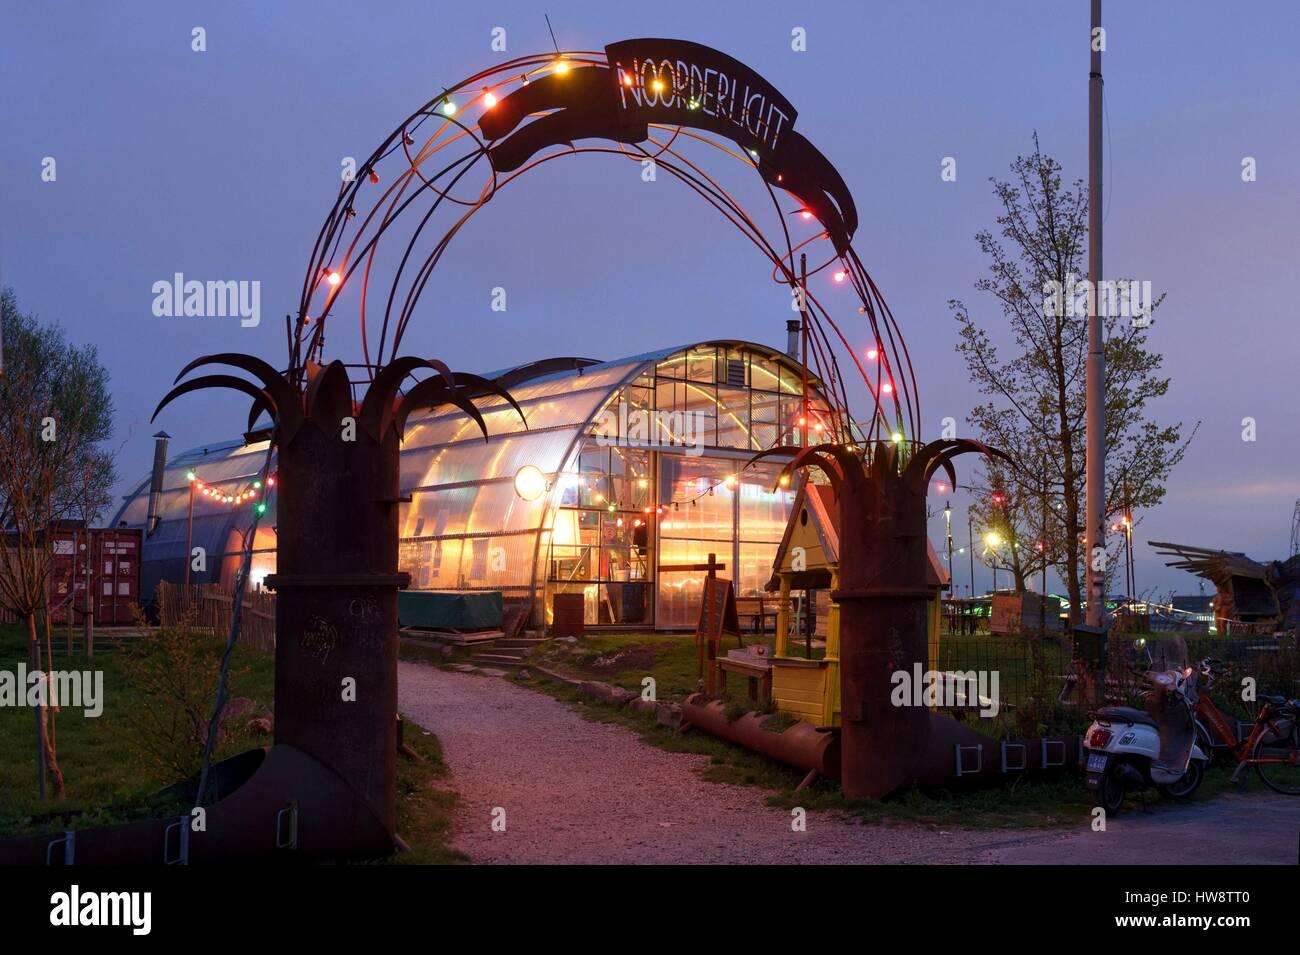 Netherlands, Northern Holland, Amsterdam, North IJ banks, NDSM district, NDSM Werf, Noordelicht cafe restaurant - Stock Image